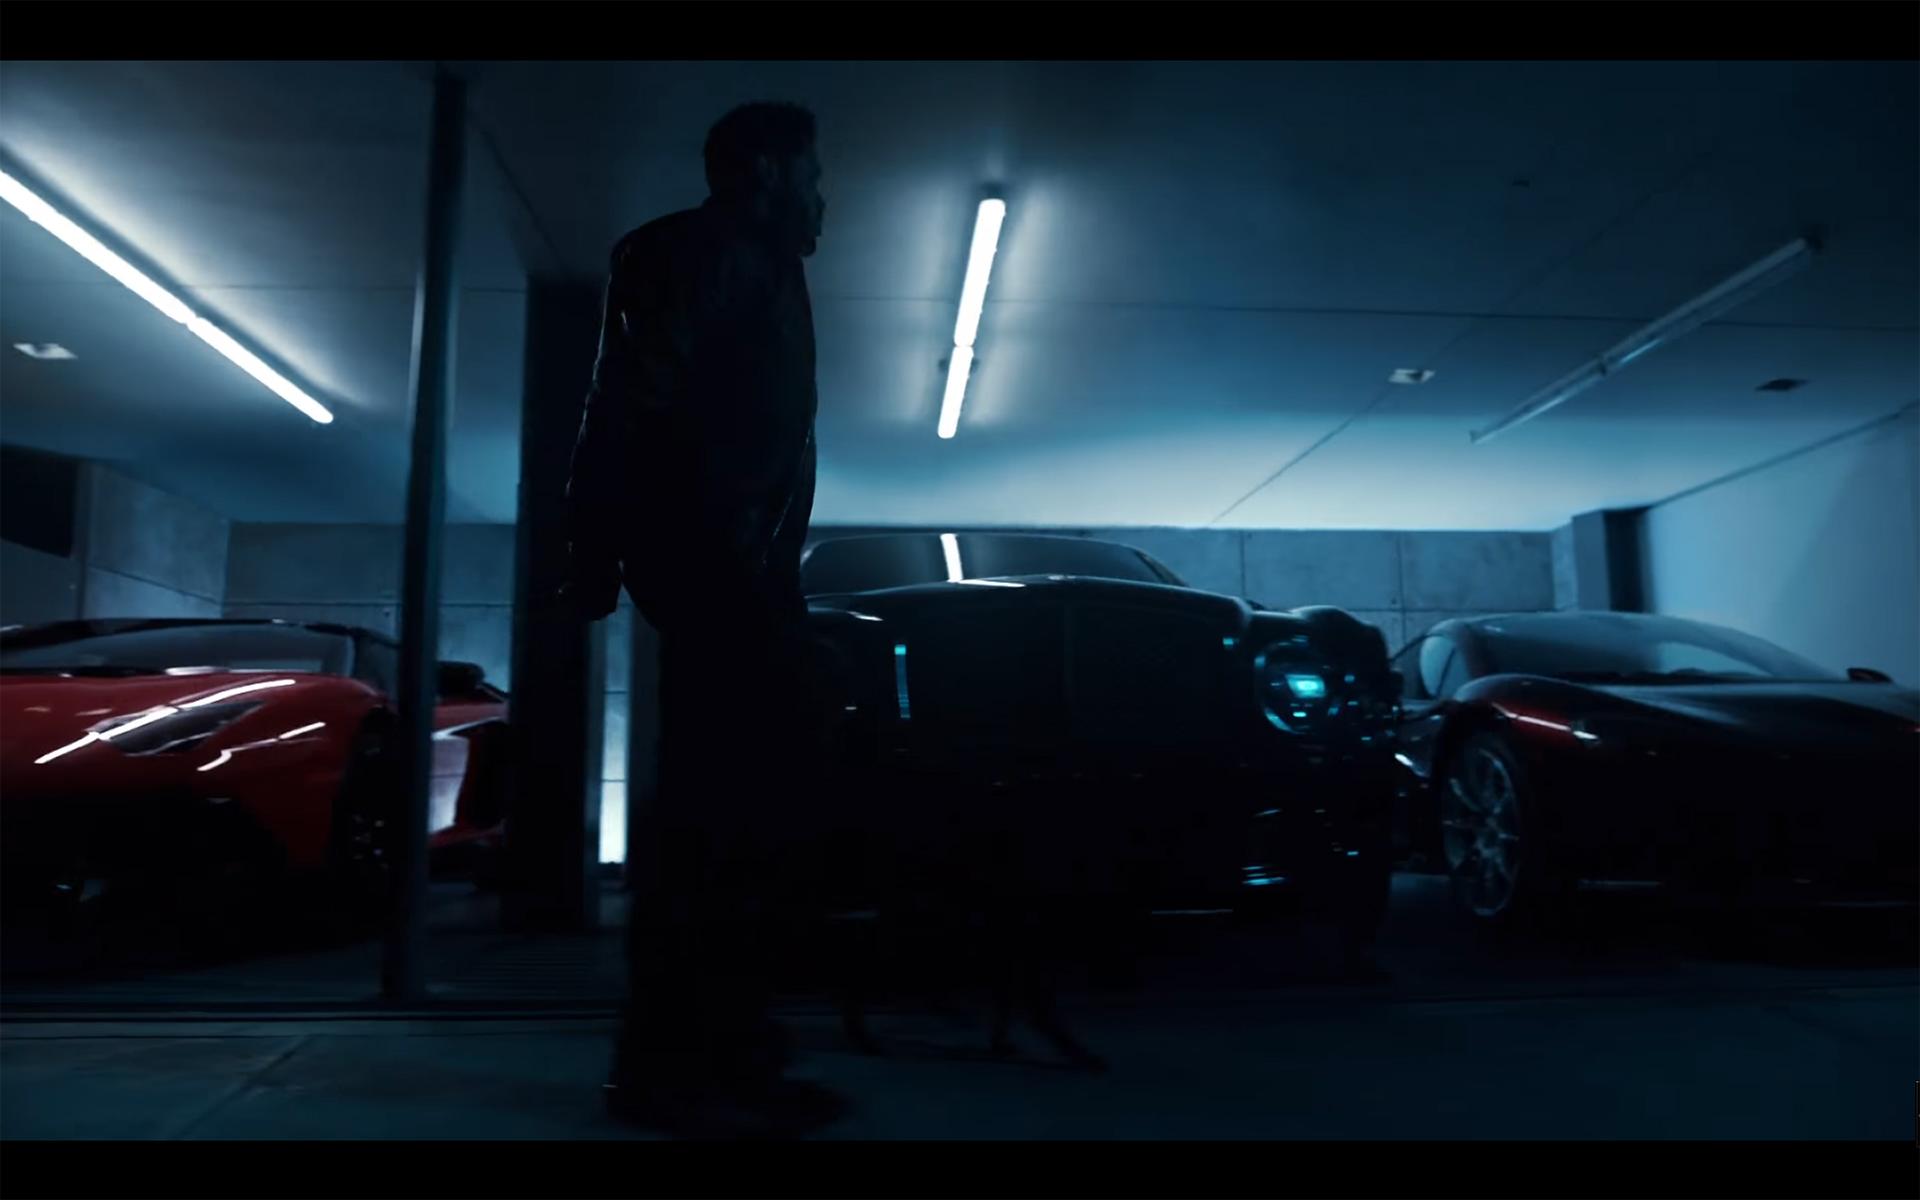 Starboy - The Weeknd - cat - McLaren P1 - walking in garage